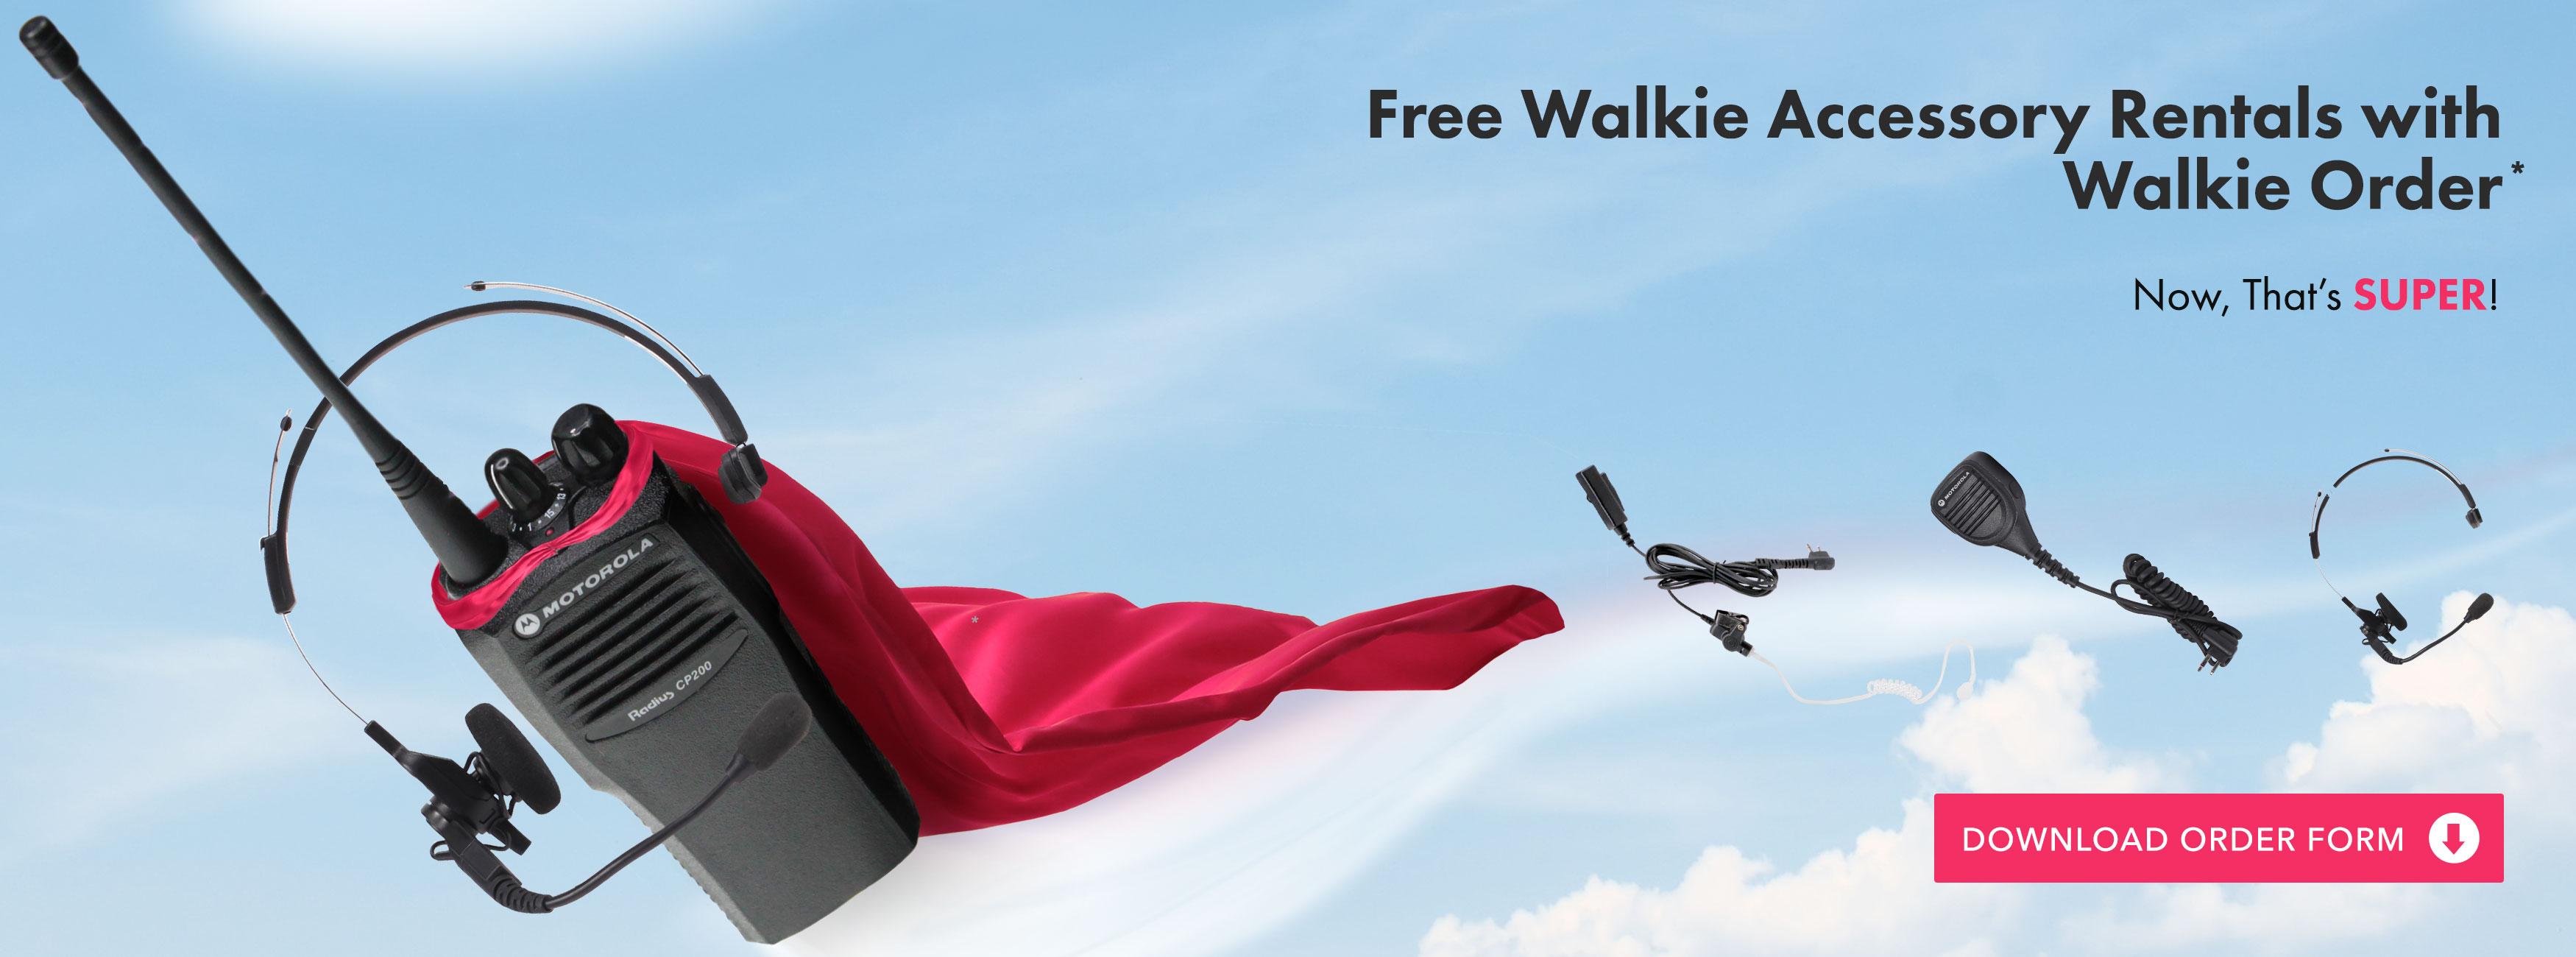 Walkie flying through the air